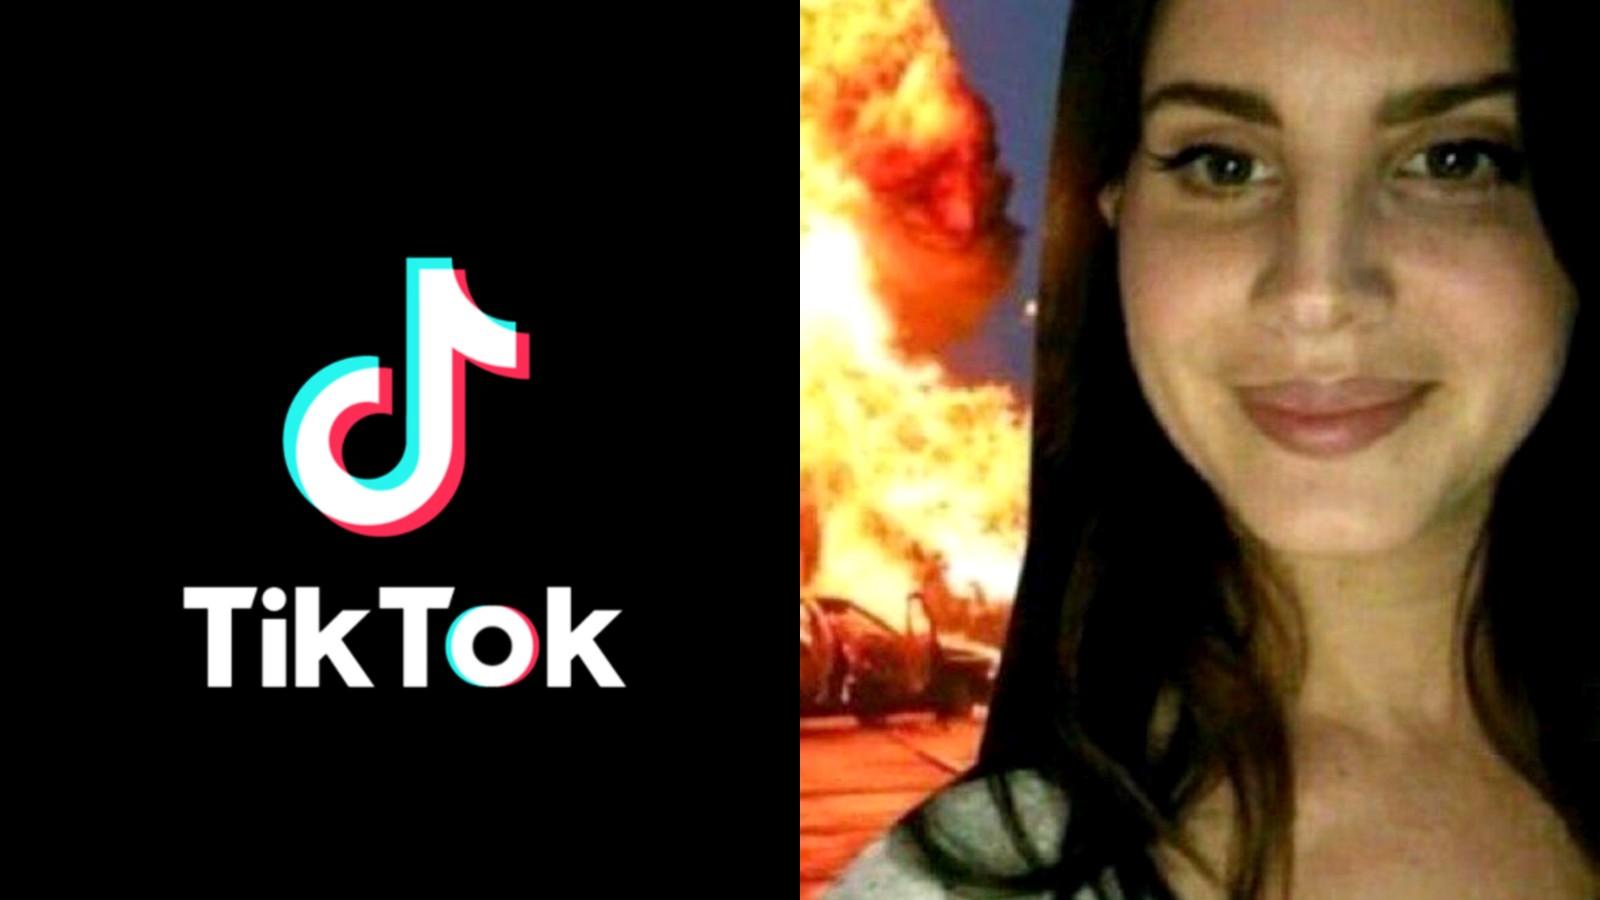 The 'Lana Cult' profile picture next to the TikTok logo